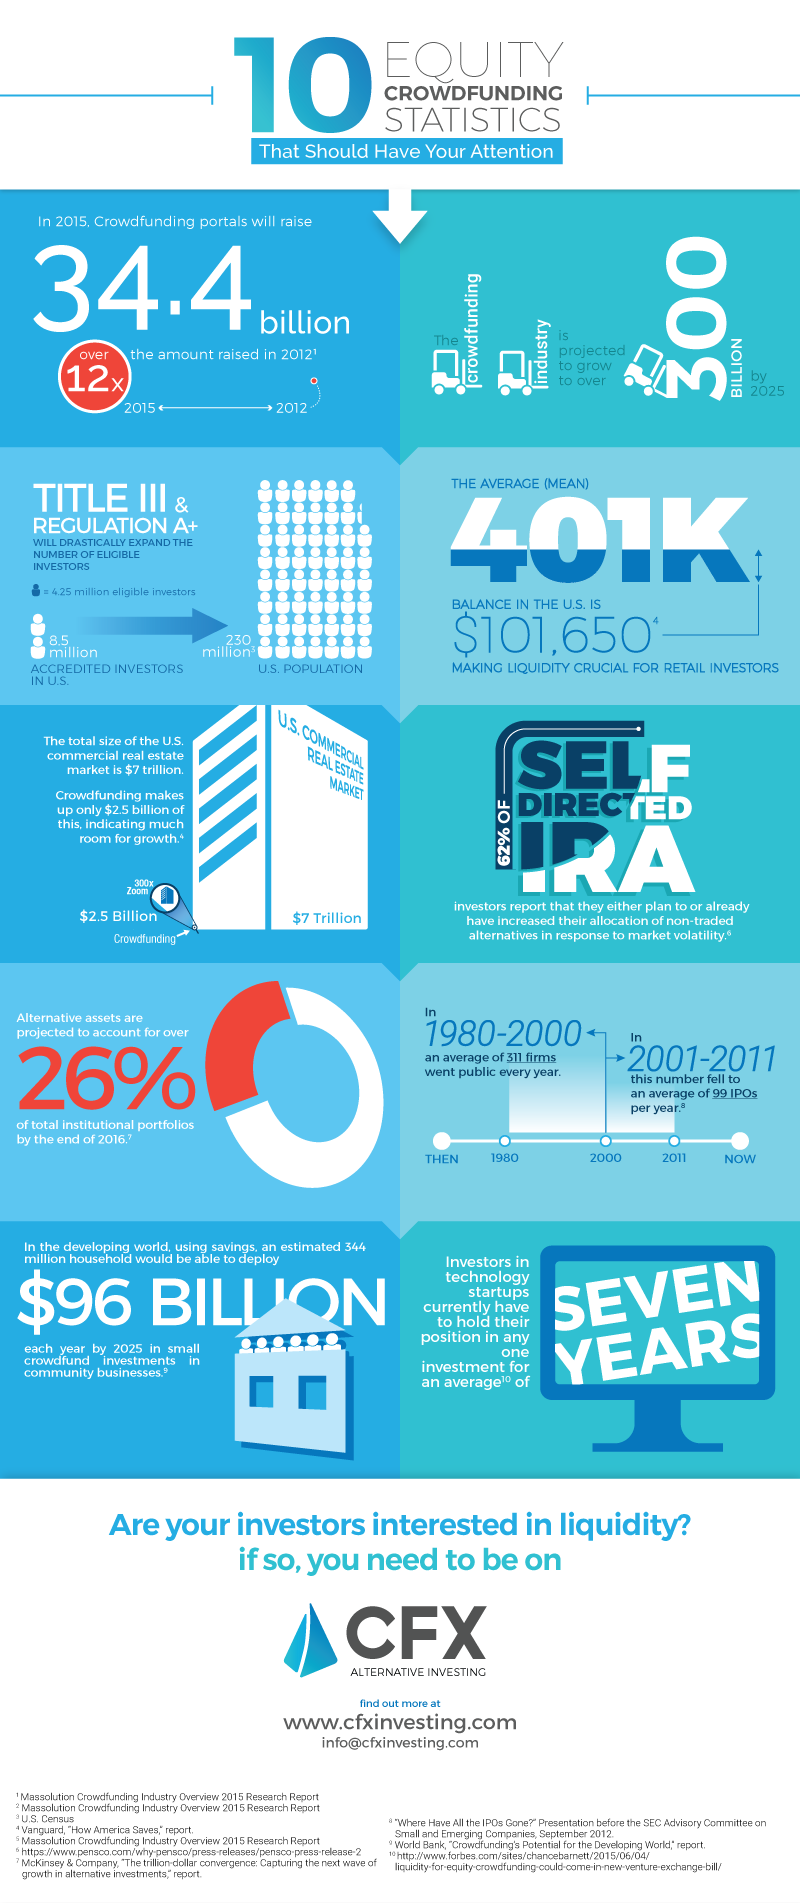 Crowdfunding Statistics